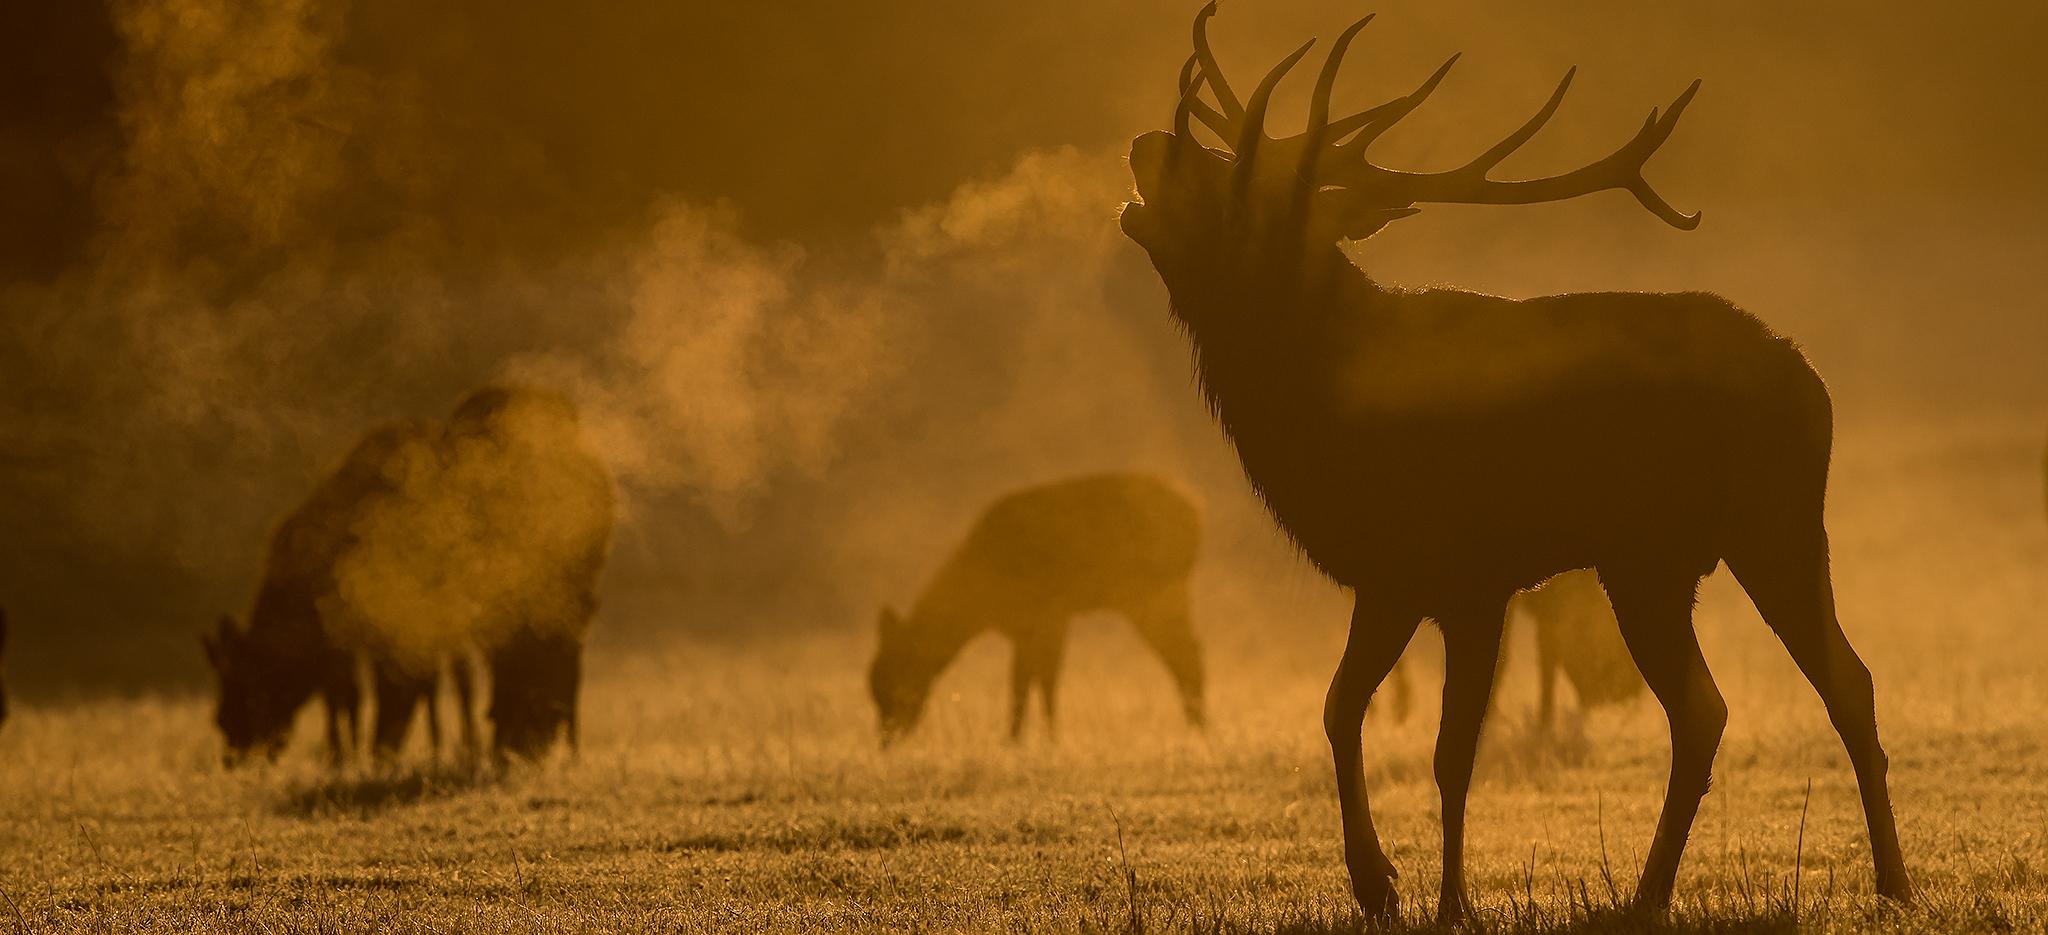 Deer - Natures Images regarding Deer Rut 2021